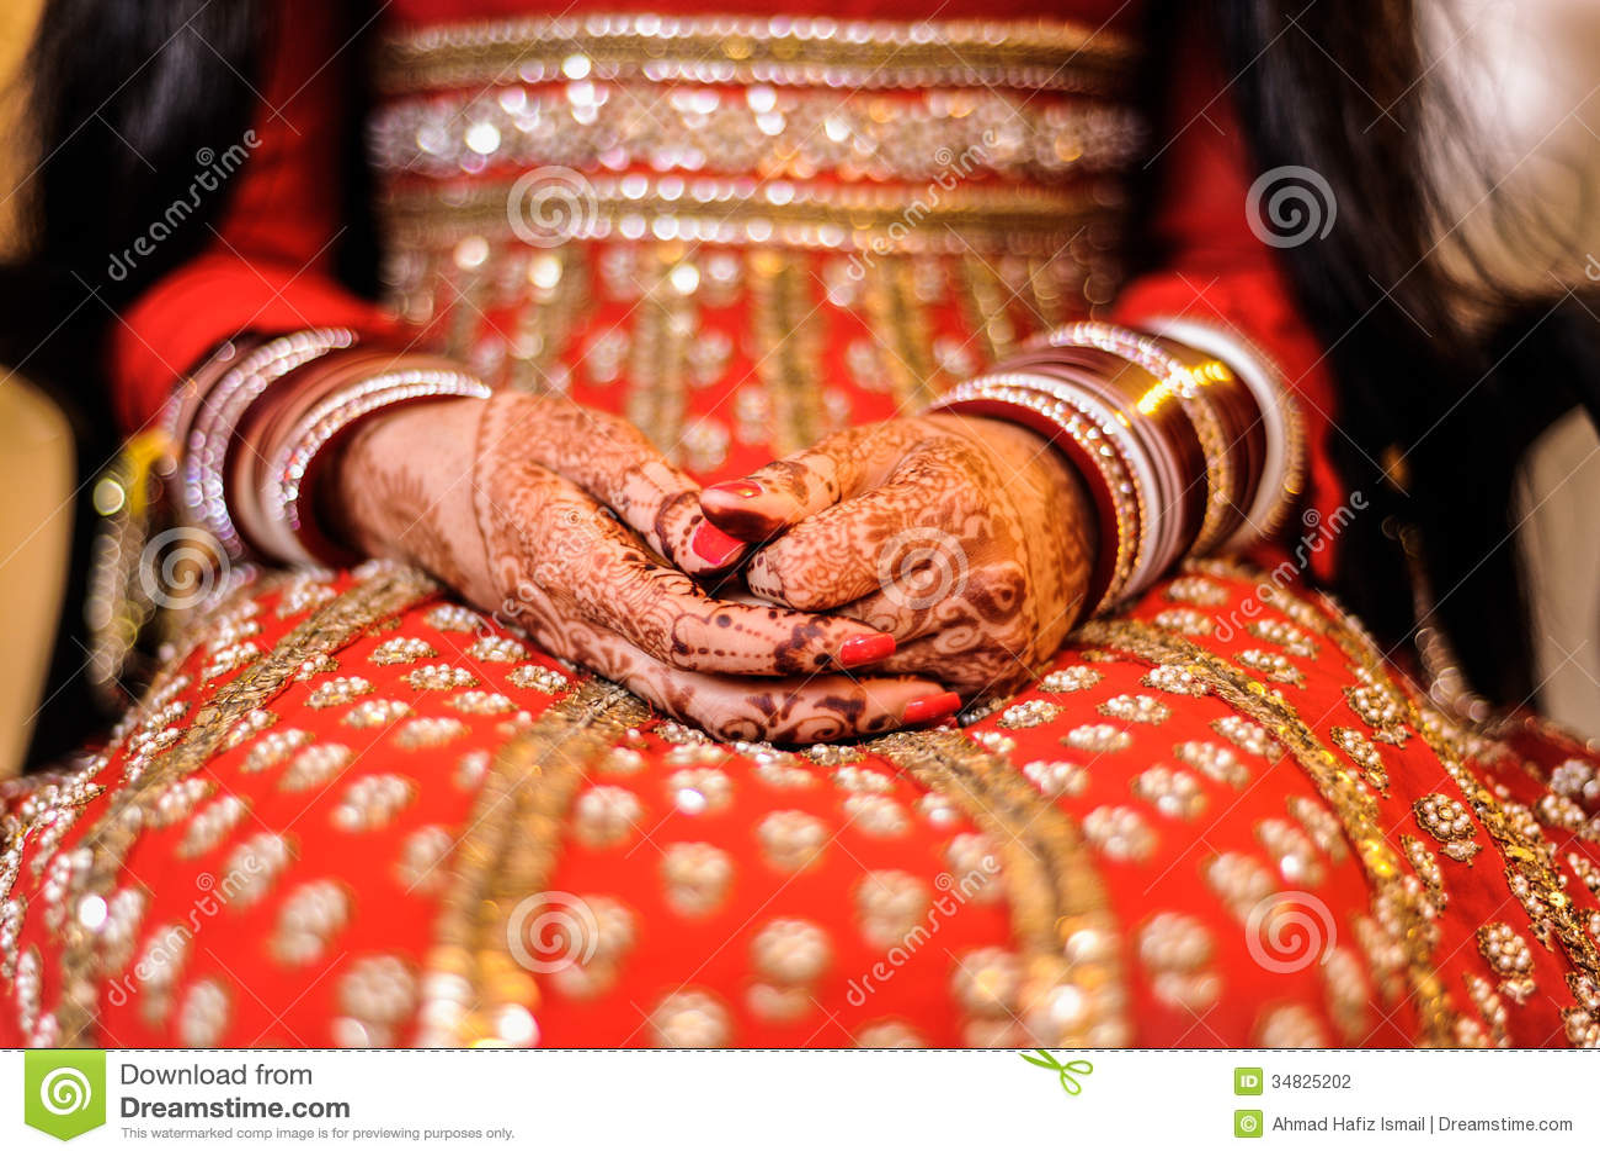 Mehendi Ceremony S Free Download : Bride s hand with henna and bangles punjabi wedding stock photo